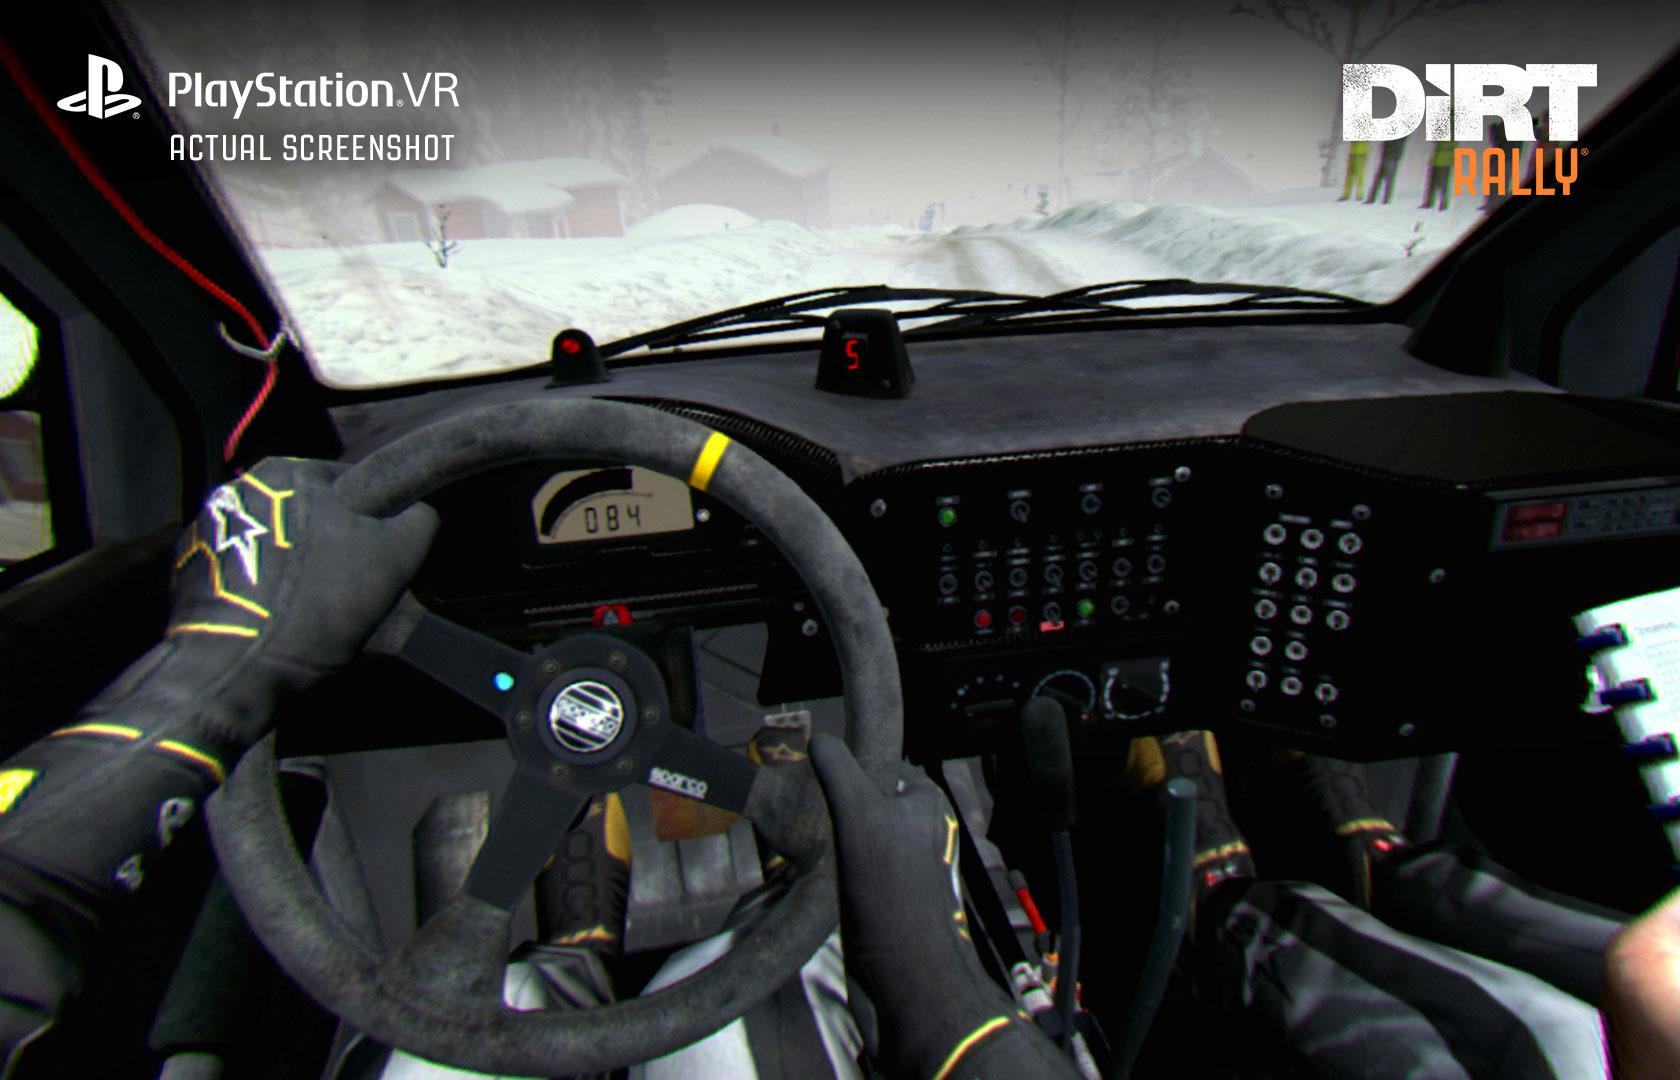 DiRT_Rally_PSVR_Announce_screen_2